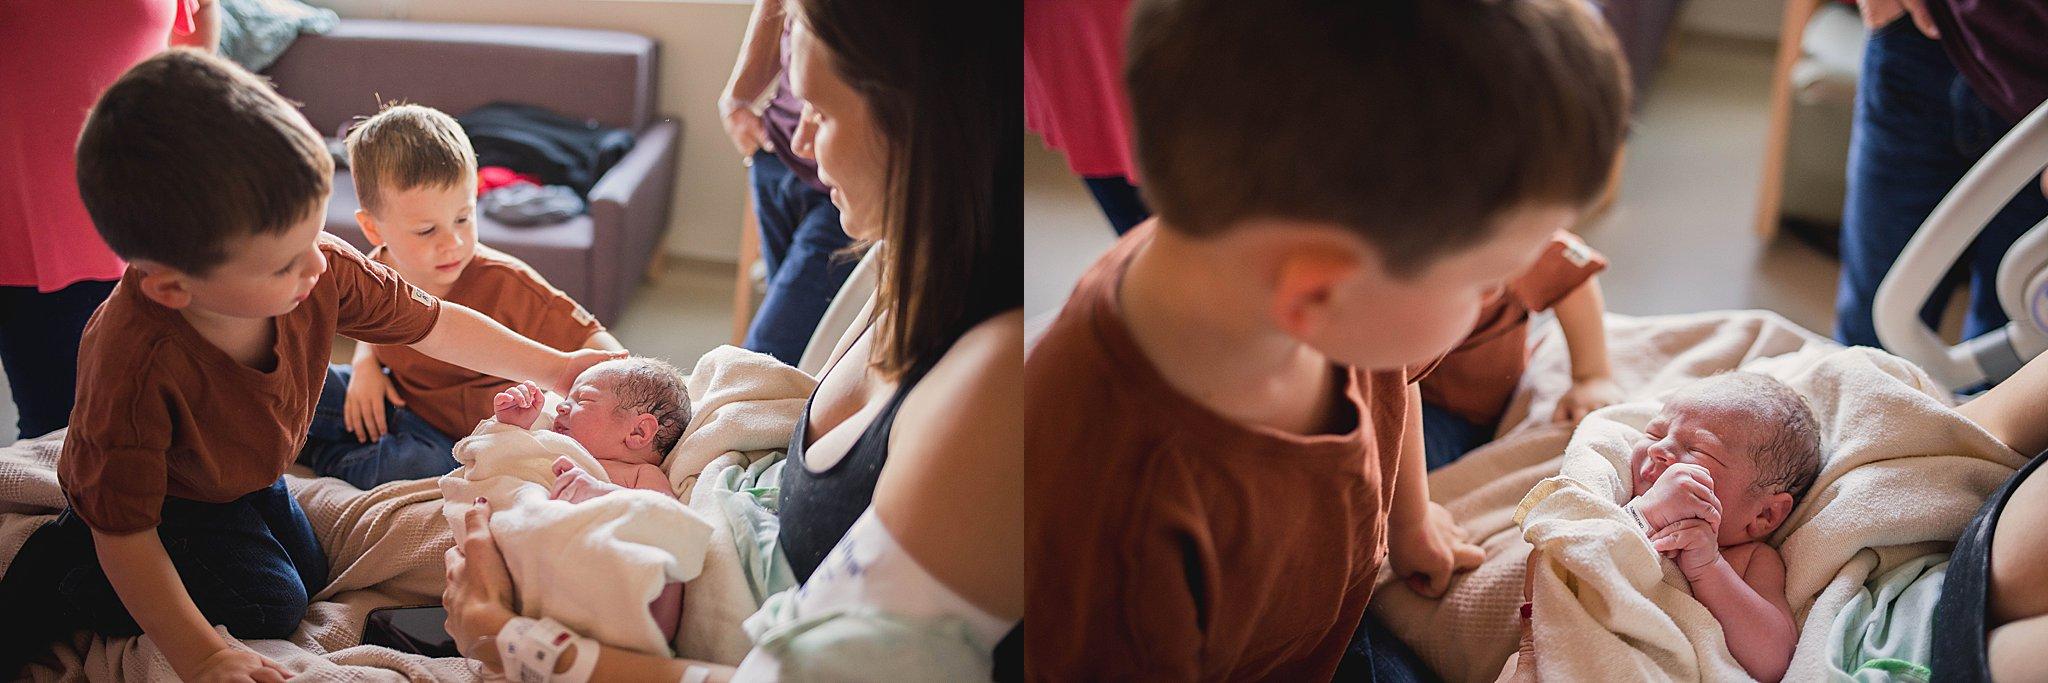 2019-03-16-hospital-baby-birth-photo-osage-beach-missouri-lake-3.jpg